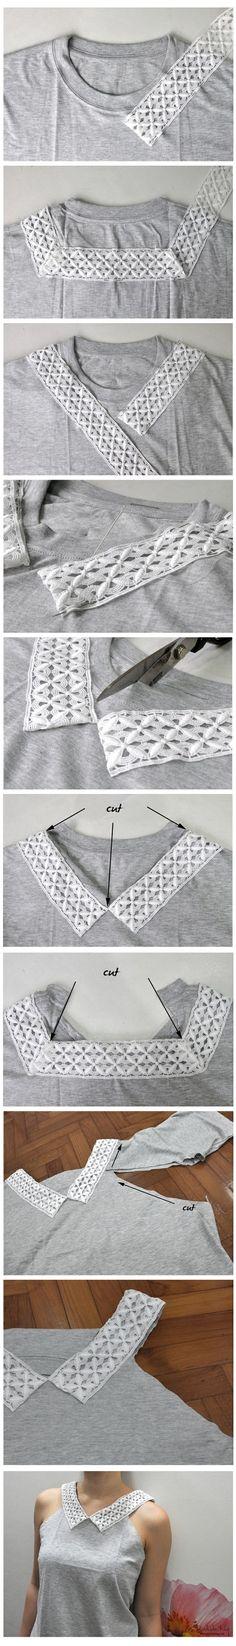 Cut t shirt